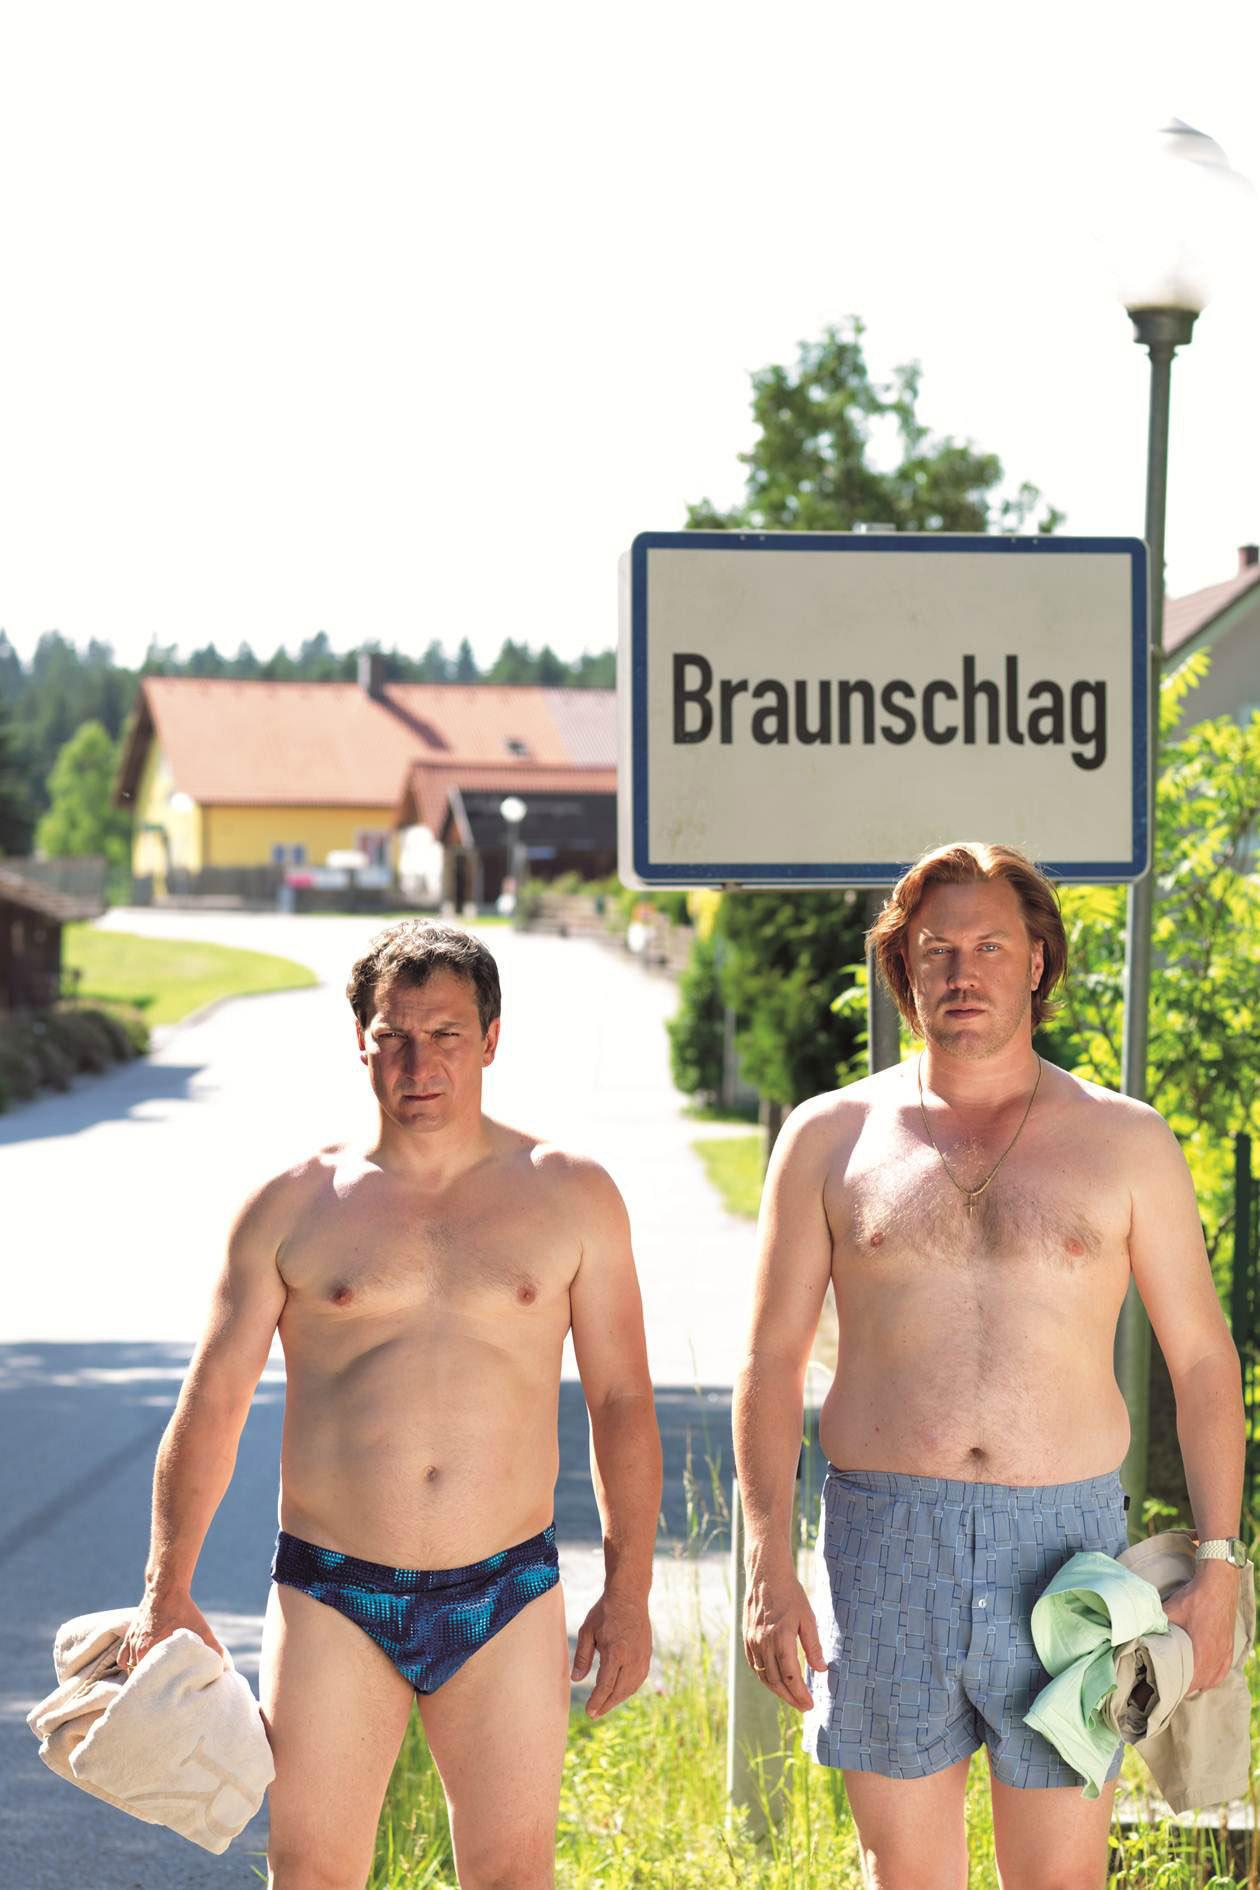 Série Séries 2013 : gros plan sur Braunschlag (Autriche)